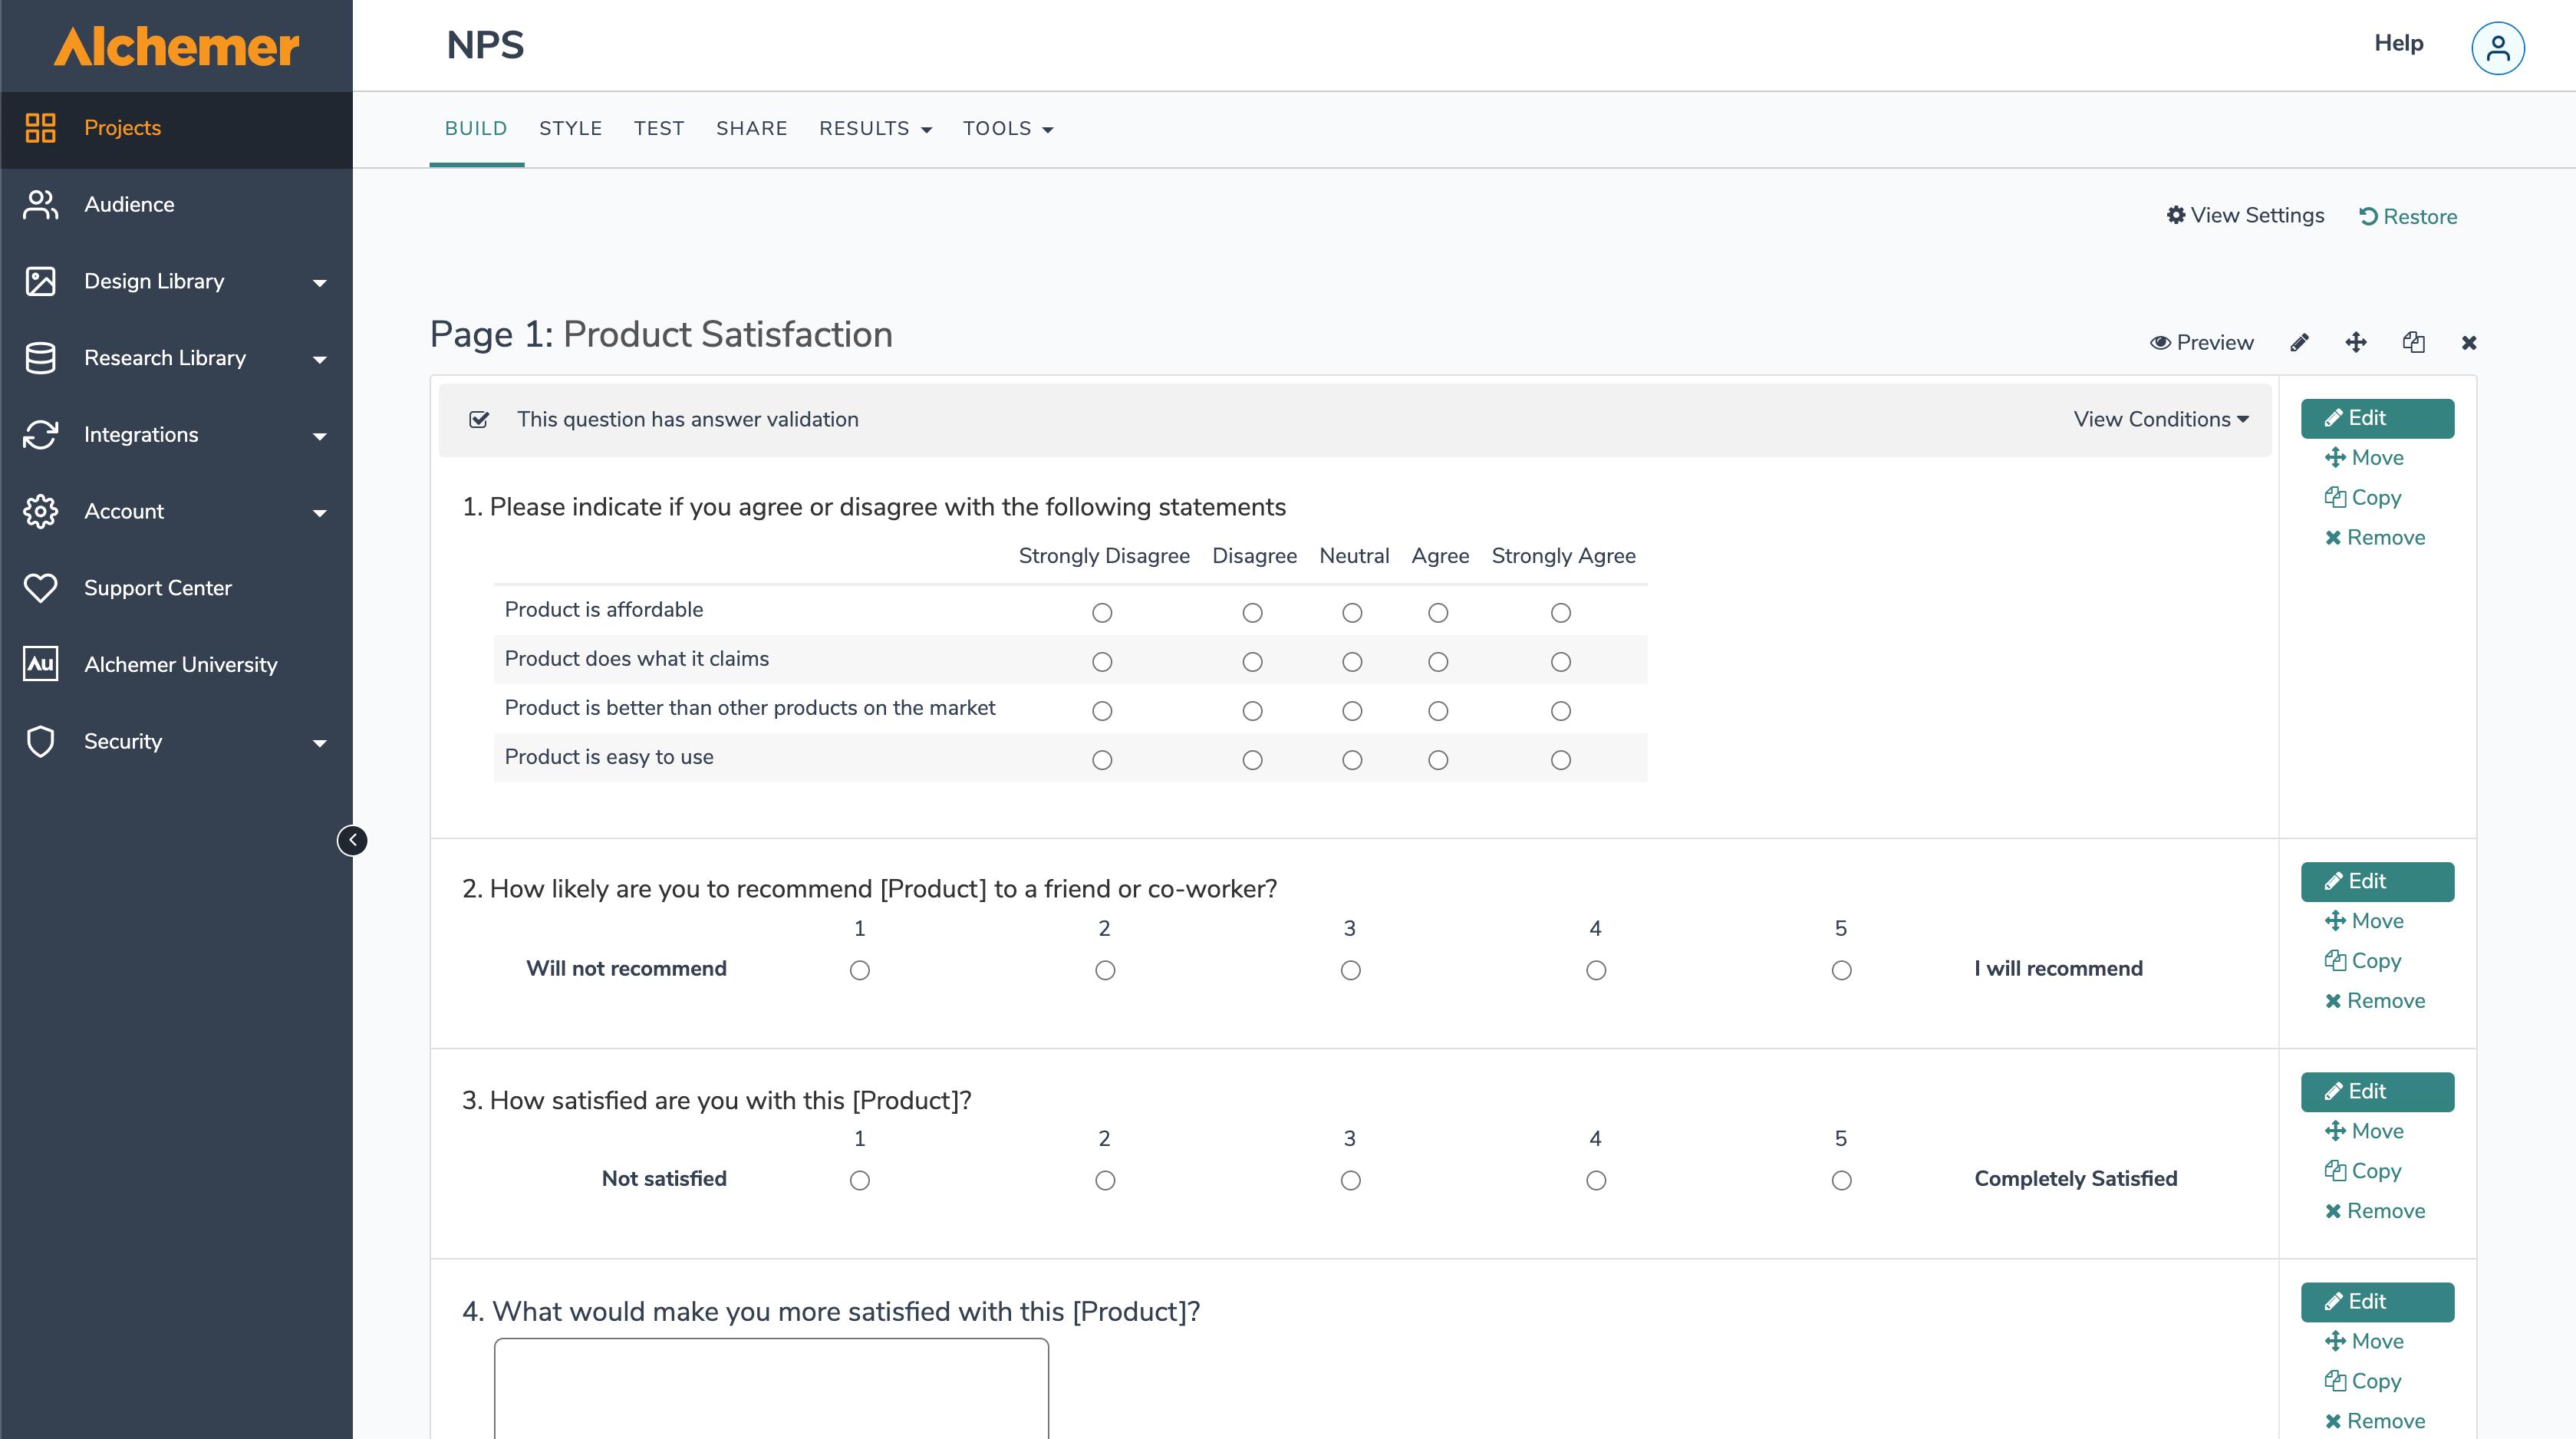 Alchemer Software - NPS Build